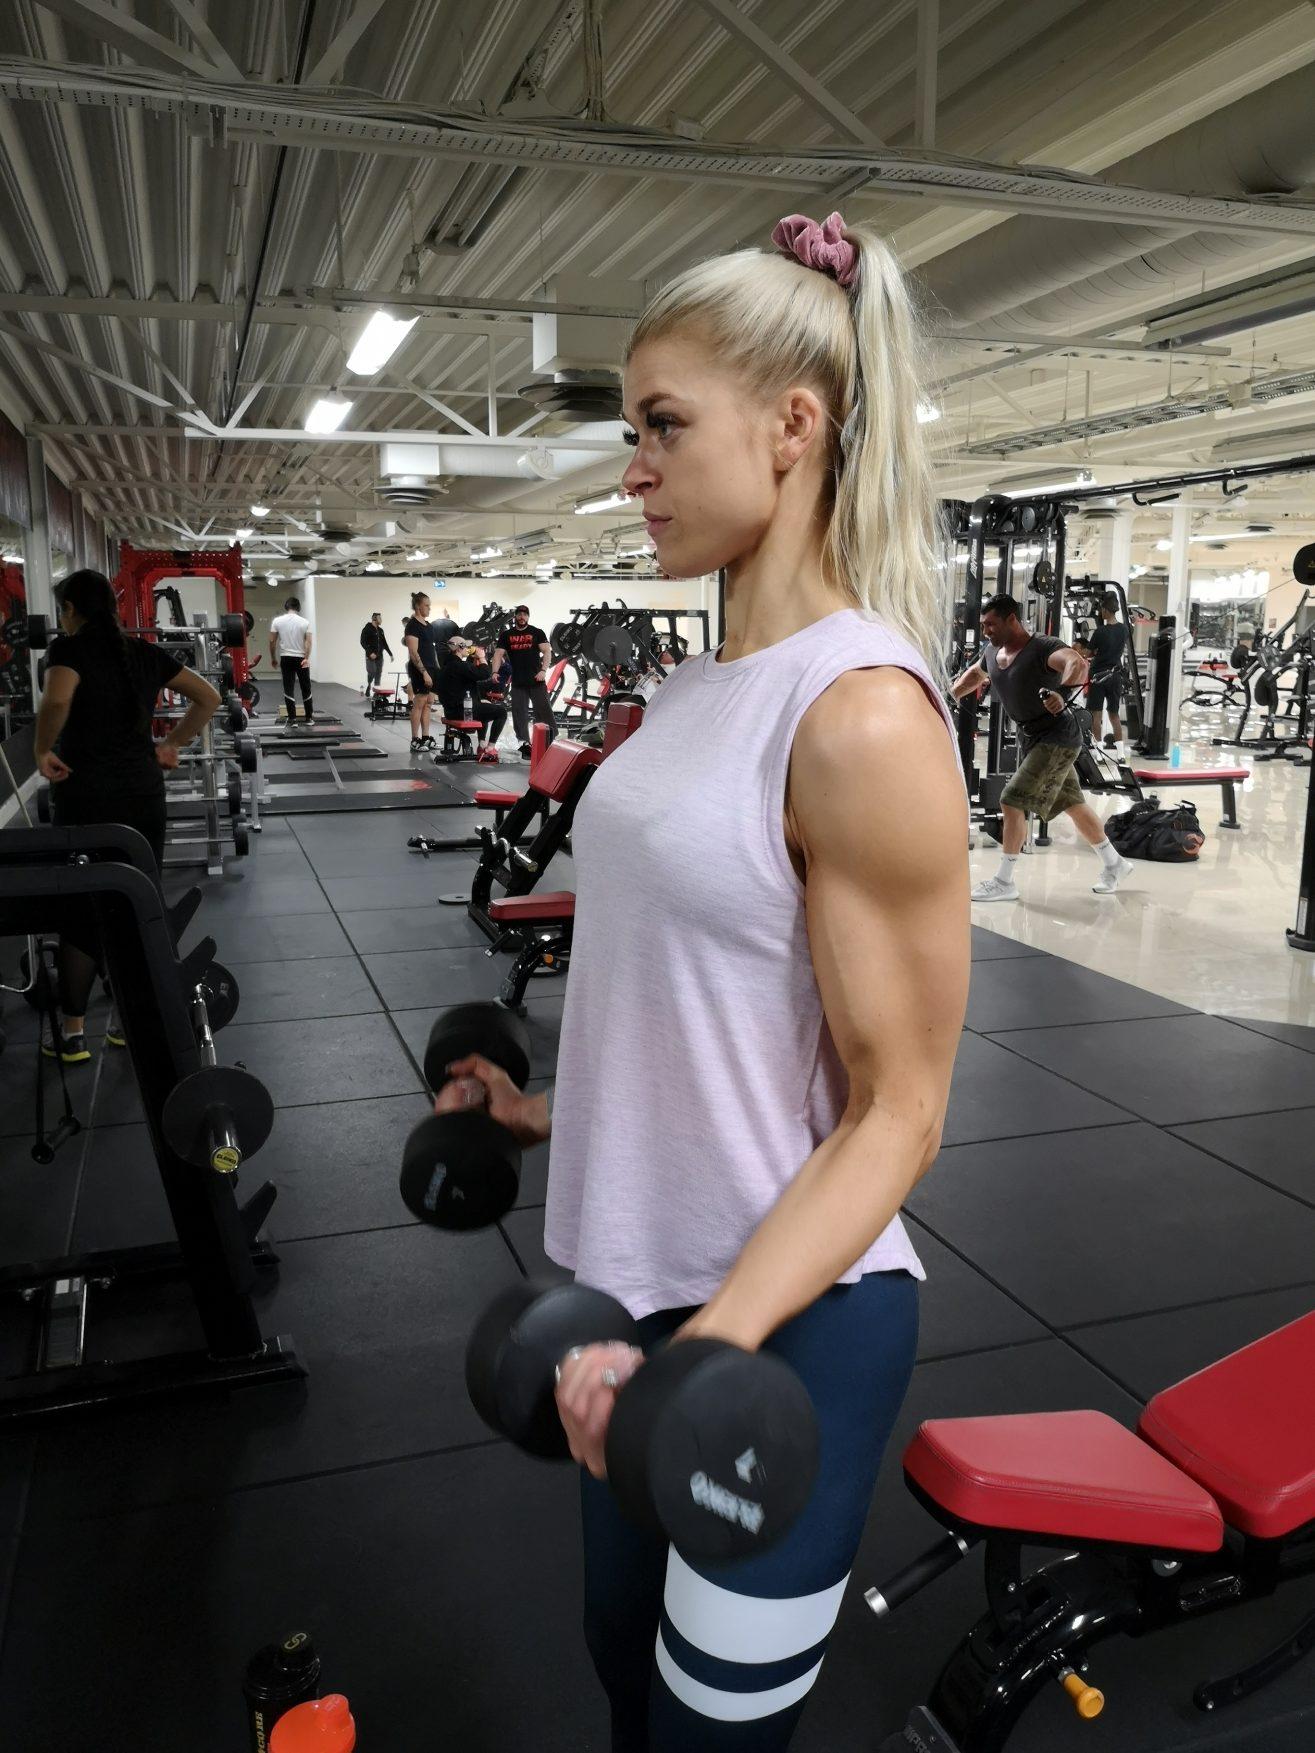 Linn Stenholm fitness bikinifitness